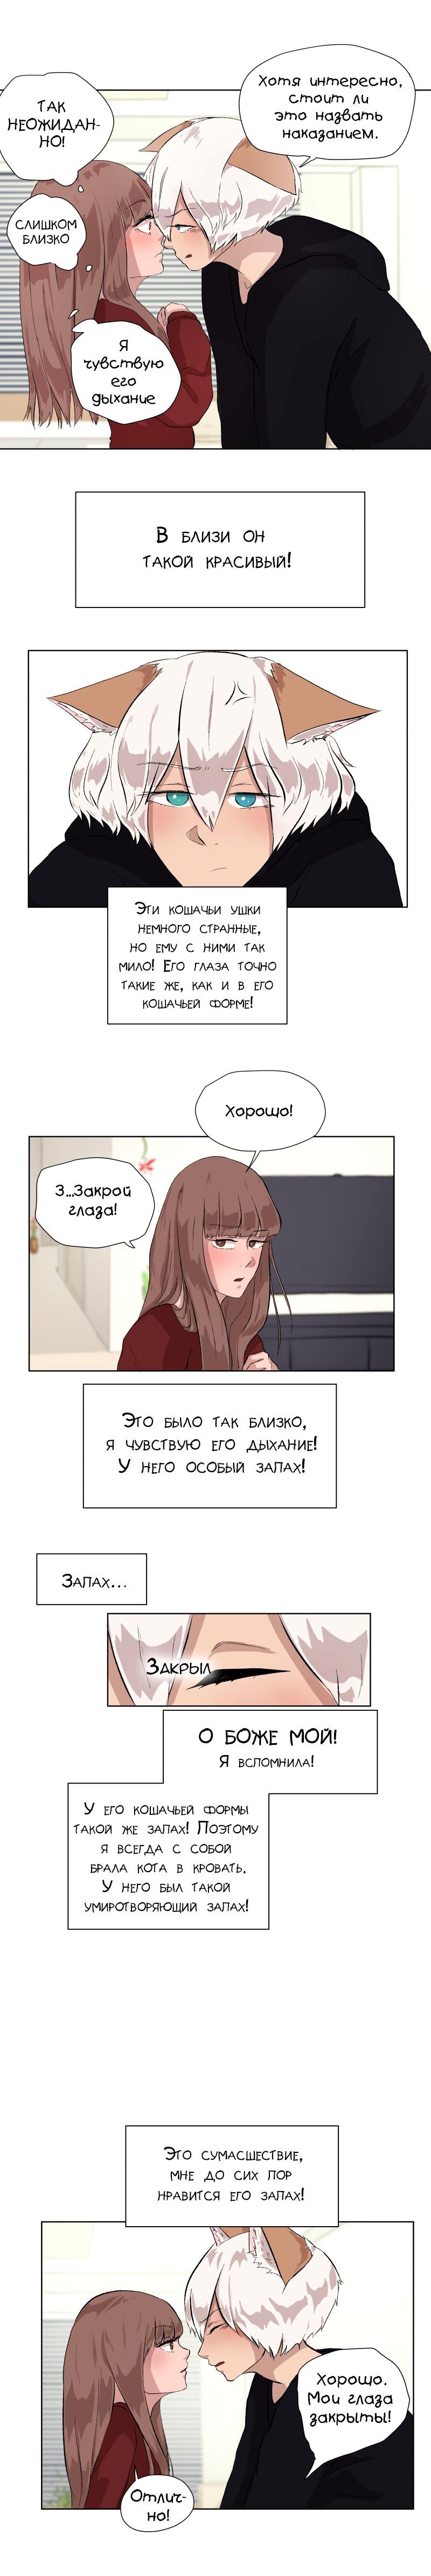 https://r1.ninemanga.com/comics/pic2/58/31802/319481/1488298011498.jpg Page 3